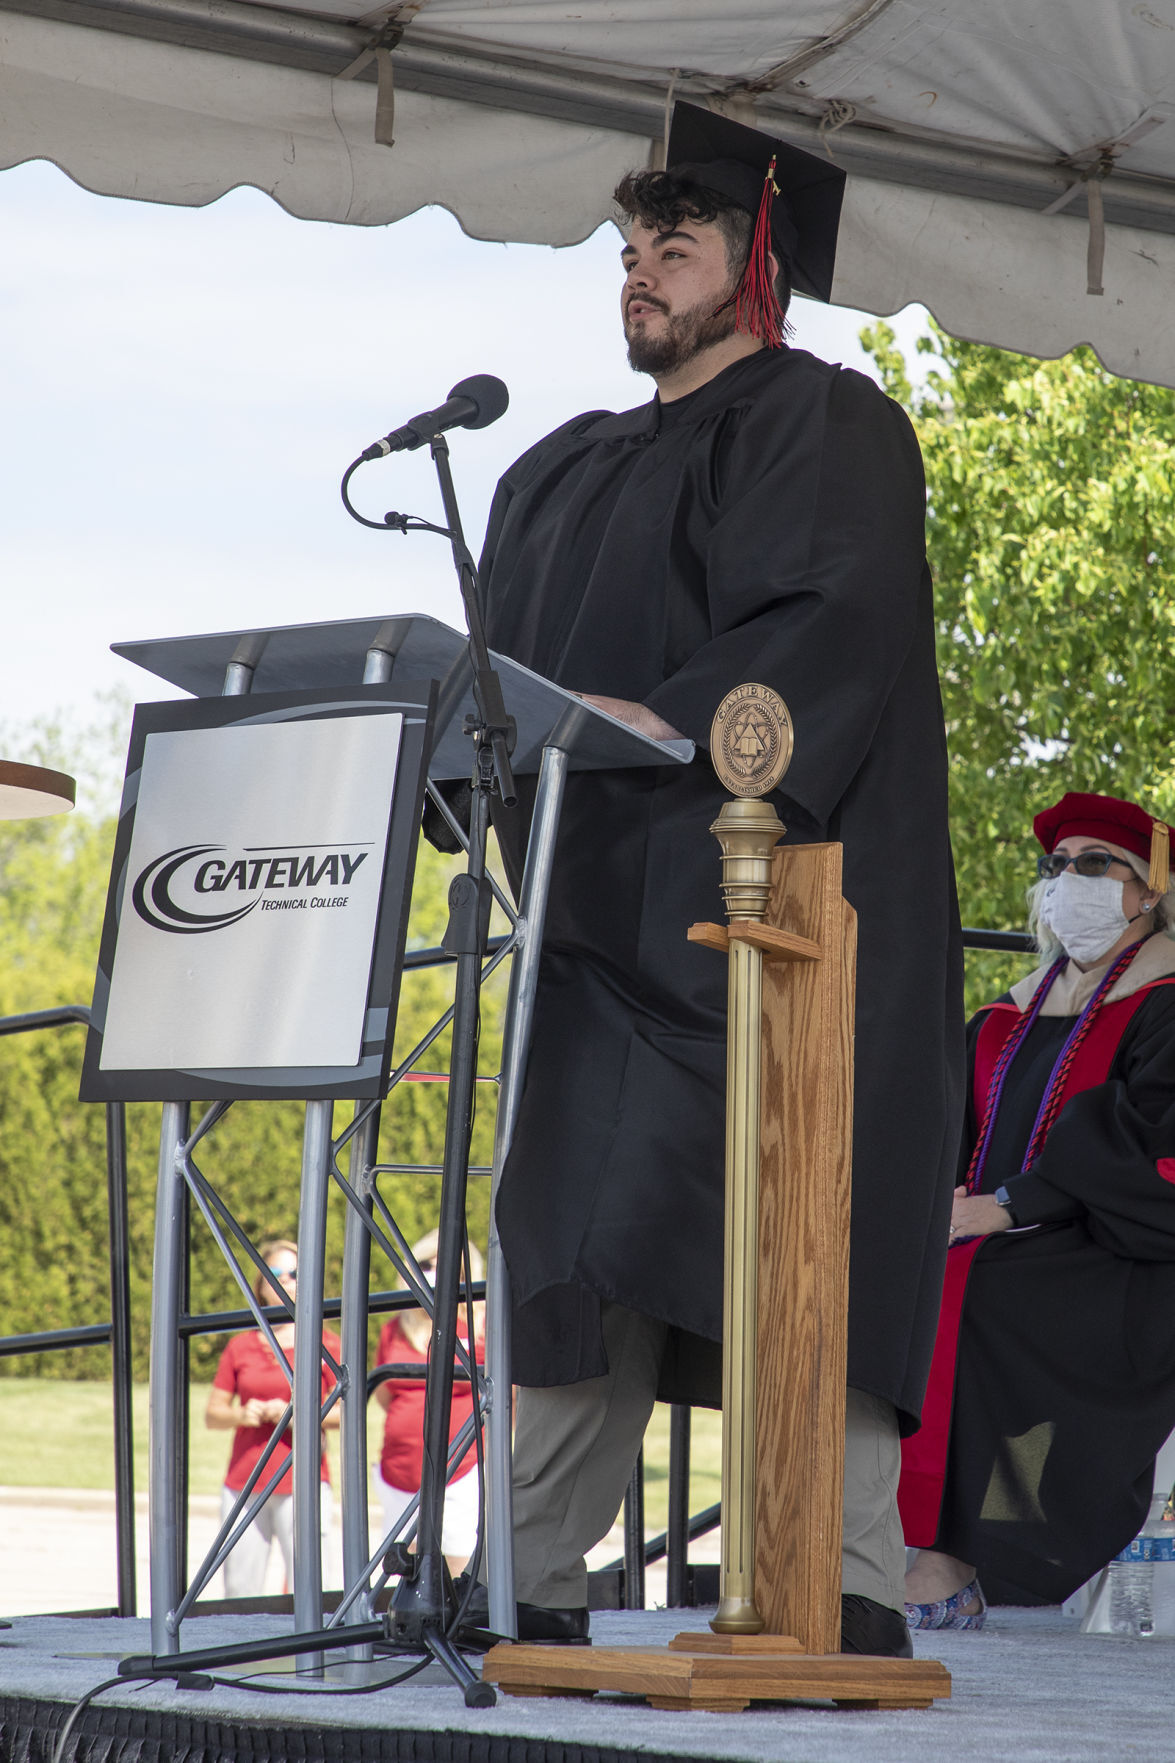 Gateway Graduation 10 a.m. Ceremony - Saturday, May 22, 2021